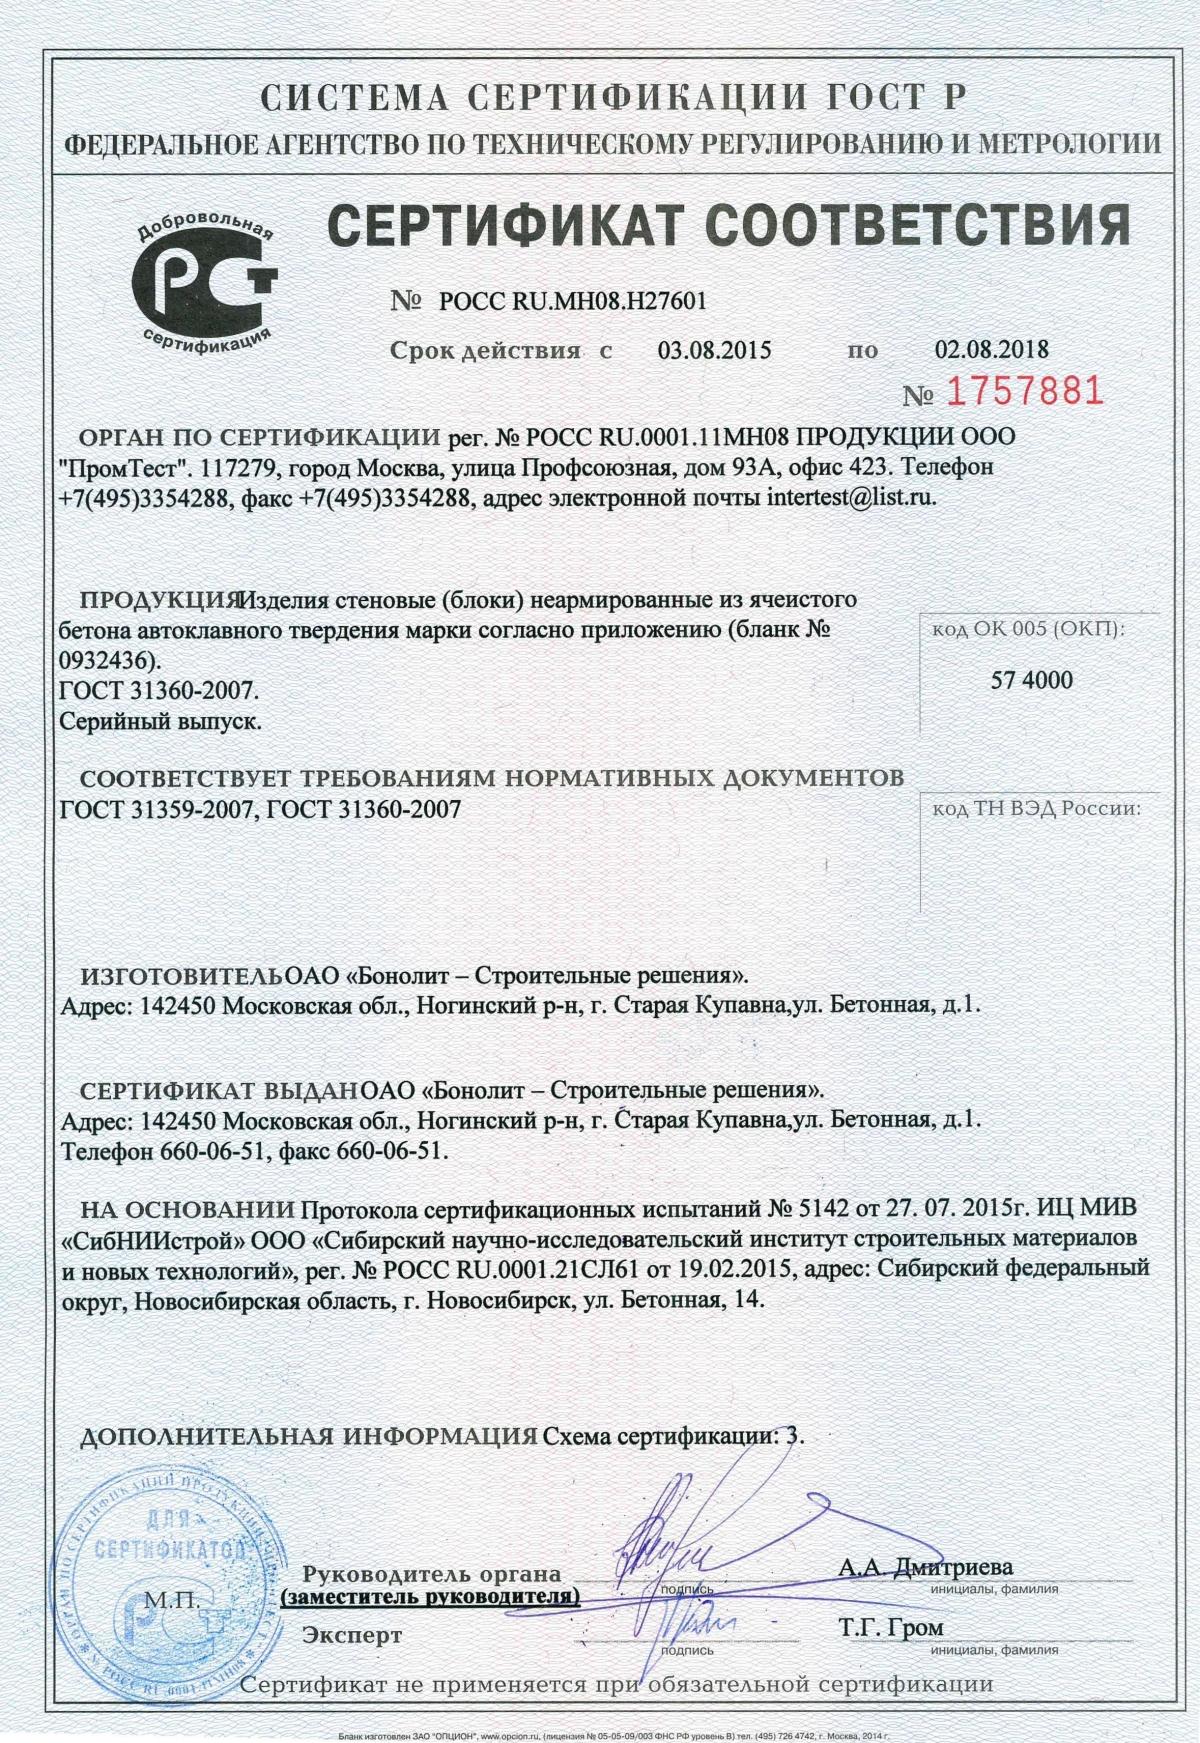 Сертификат Бонолит